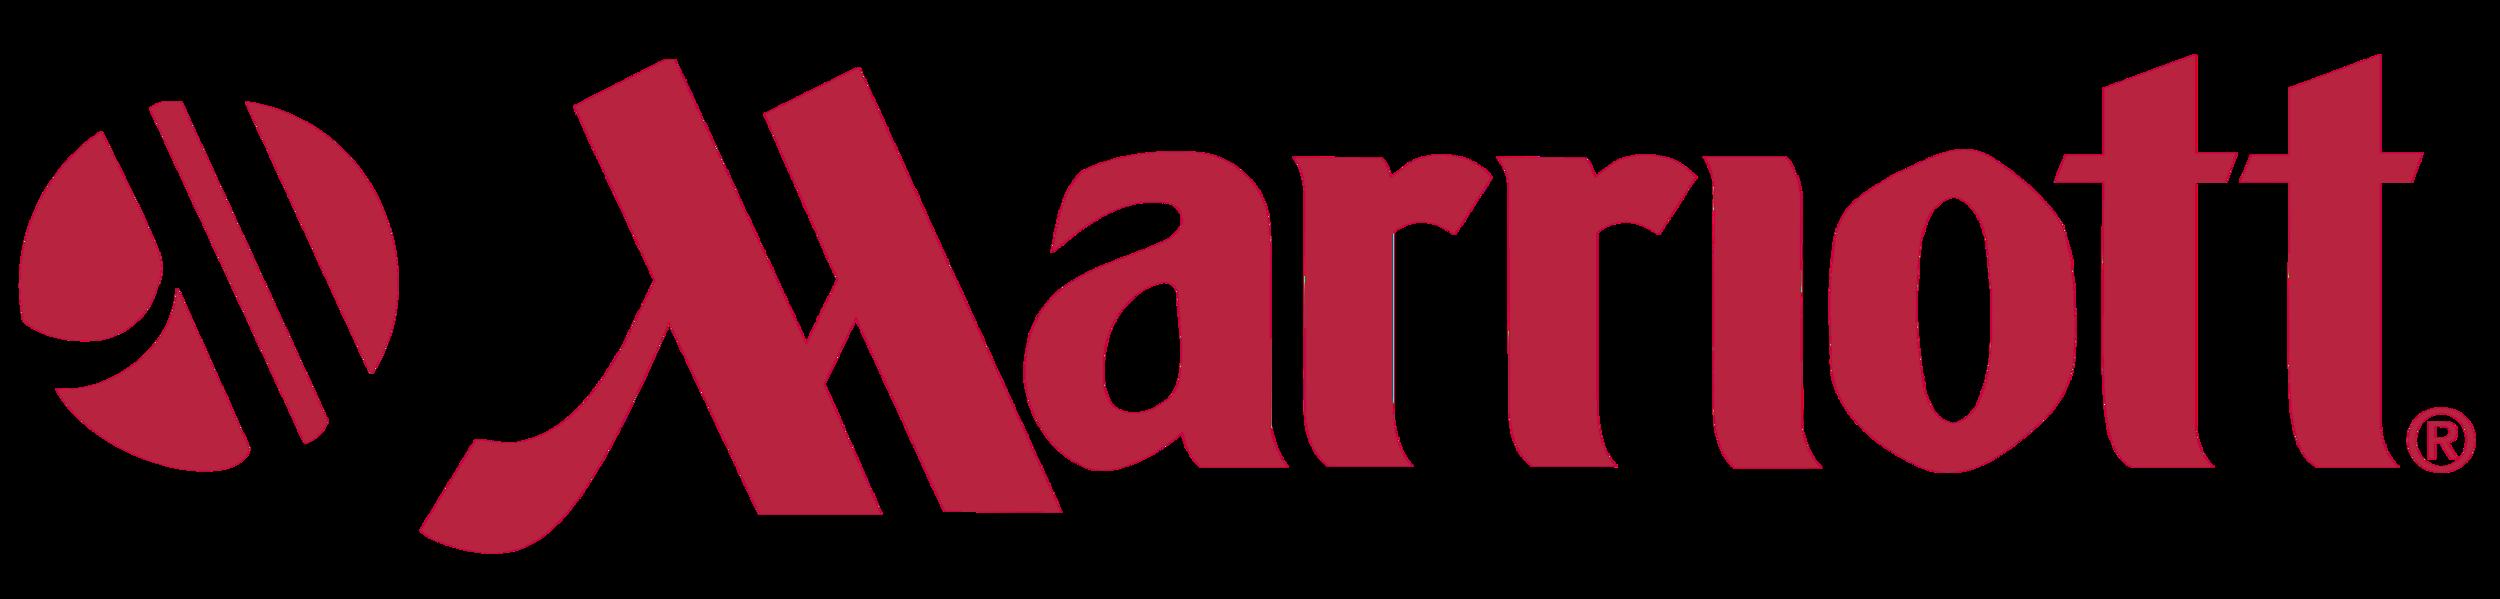 Marriott_logo_horizontal.png